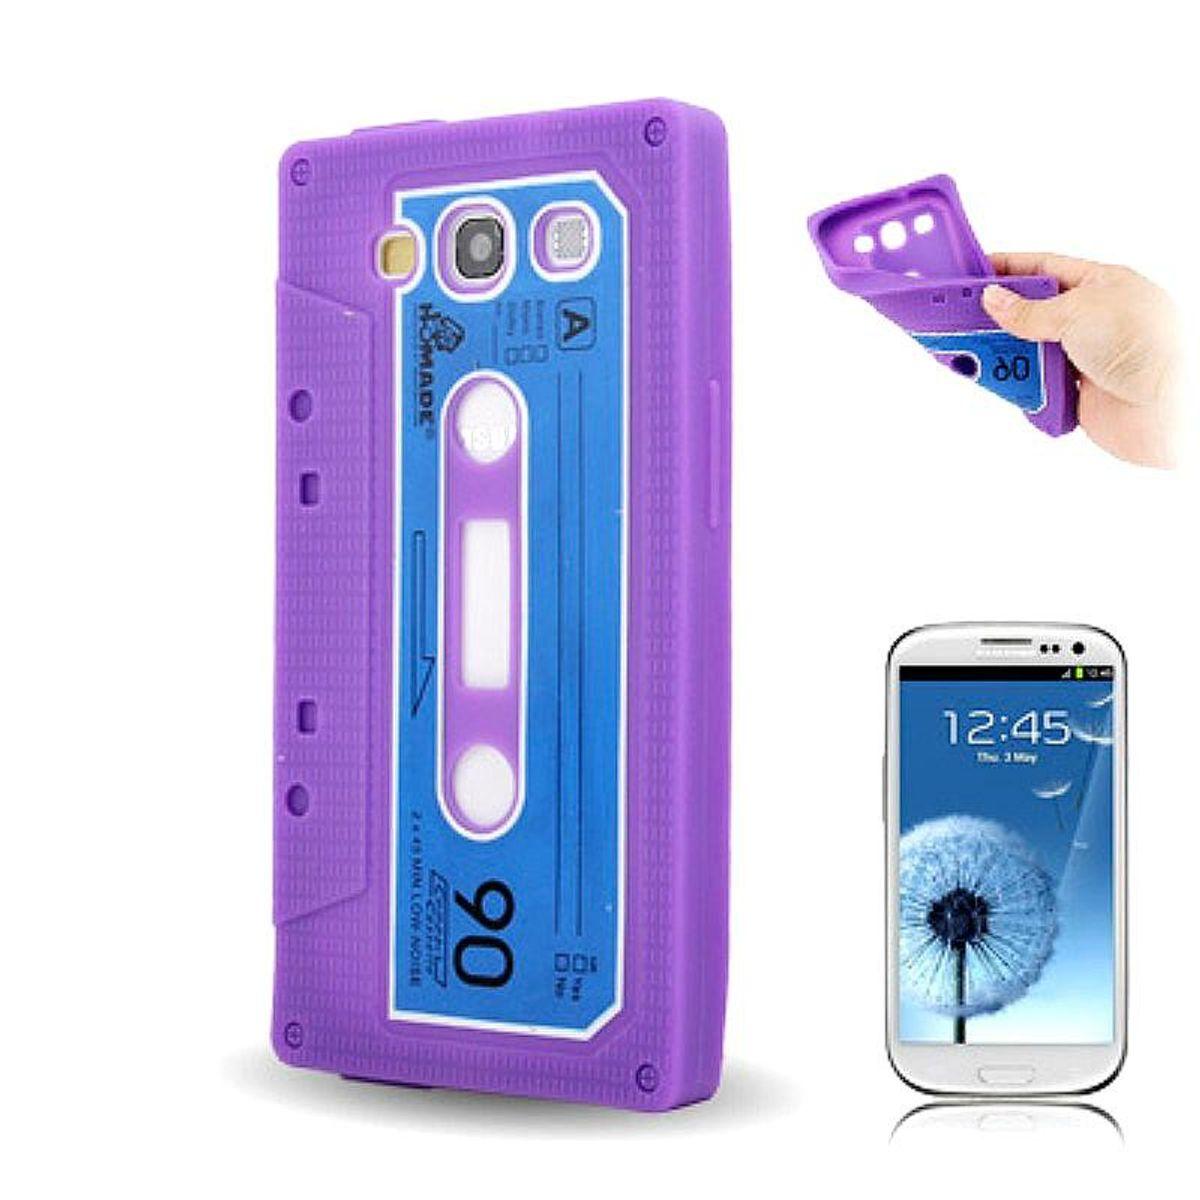 Silikon Hülle Kassette für Handy Samsung I9300 Galaxy S3 Lila